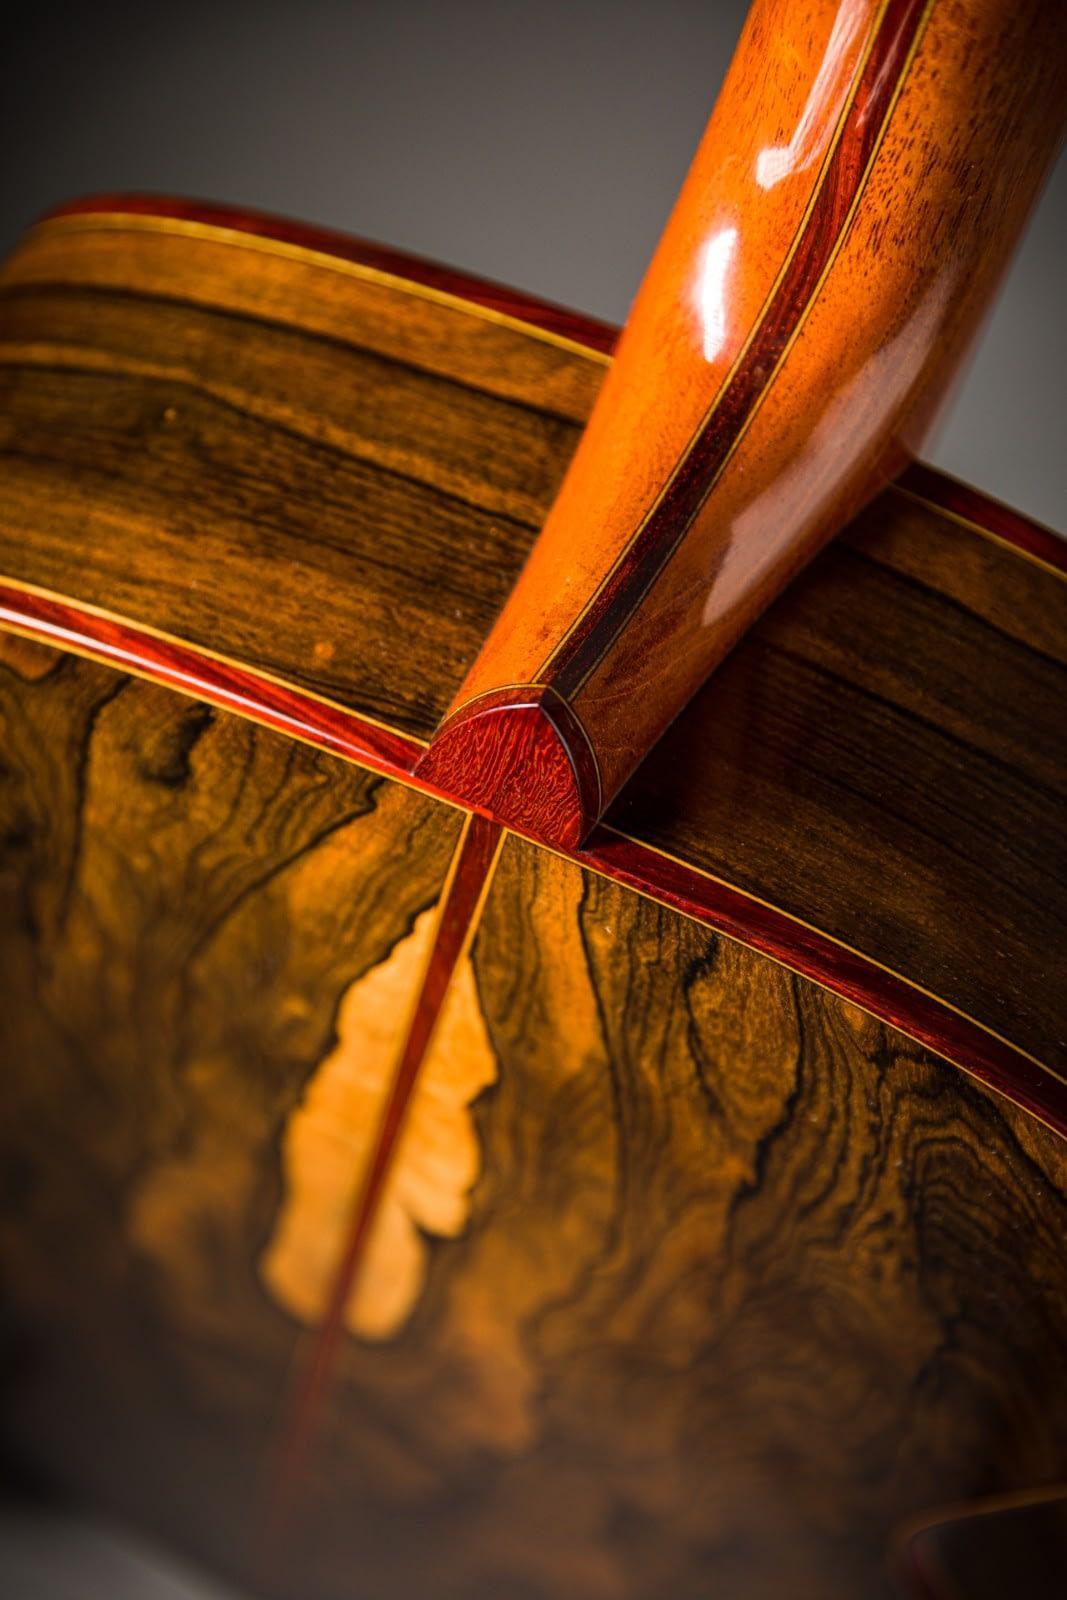 ziricote guitar back and sides padauk binding satinwood veneer laminated neck